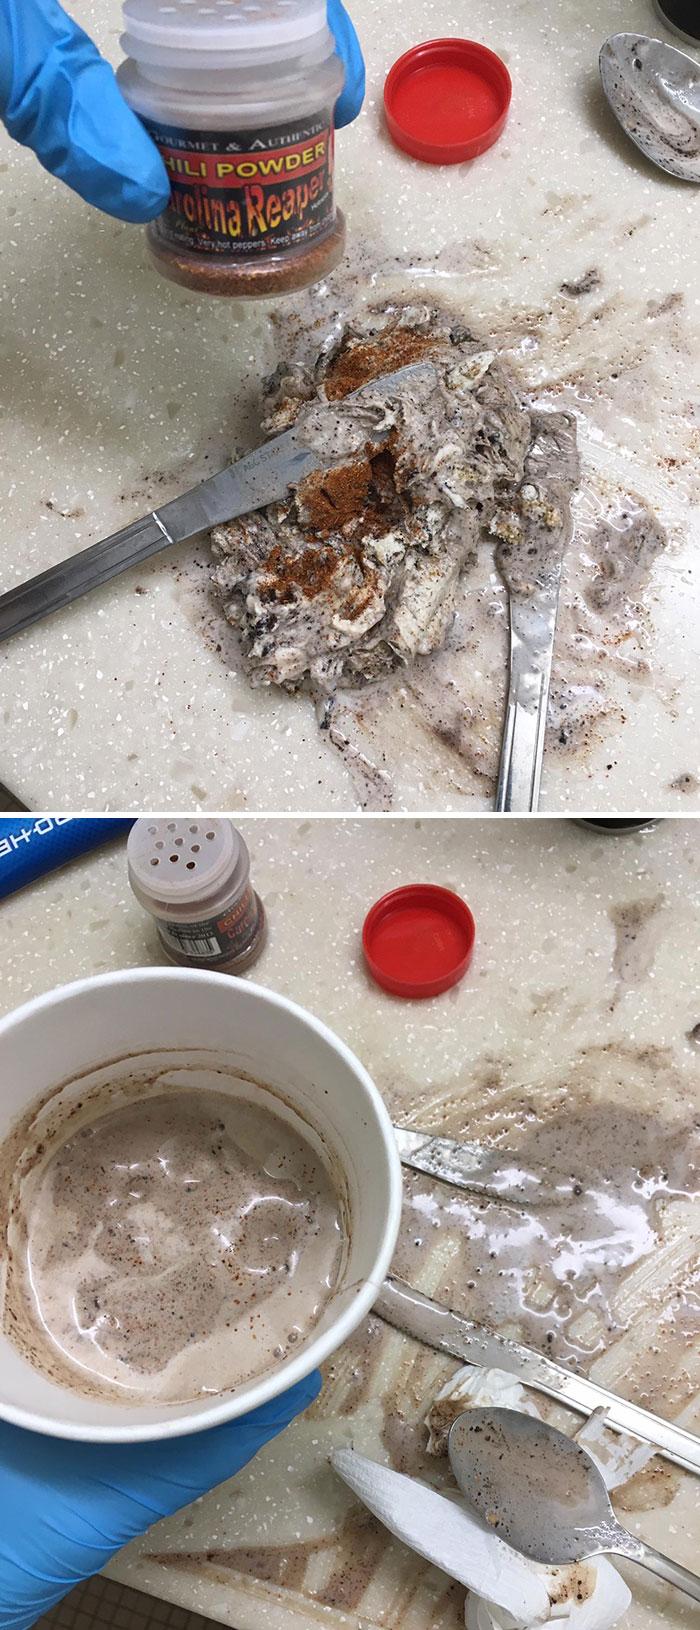 I Mixed Carolina Reaper Powder Into Half A Tub Of Ice Cream As Revenge For Food Thief At My Community Freezer